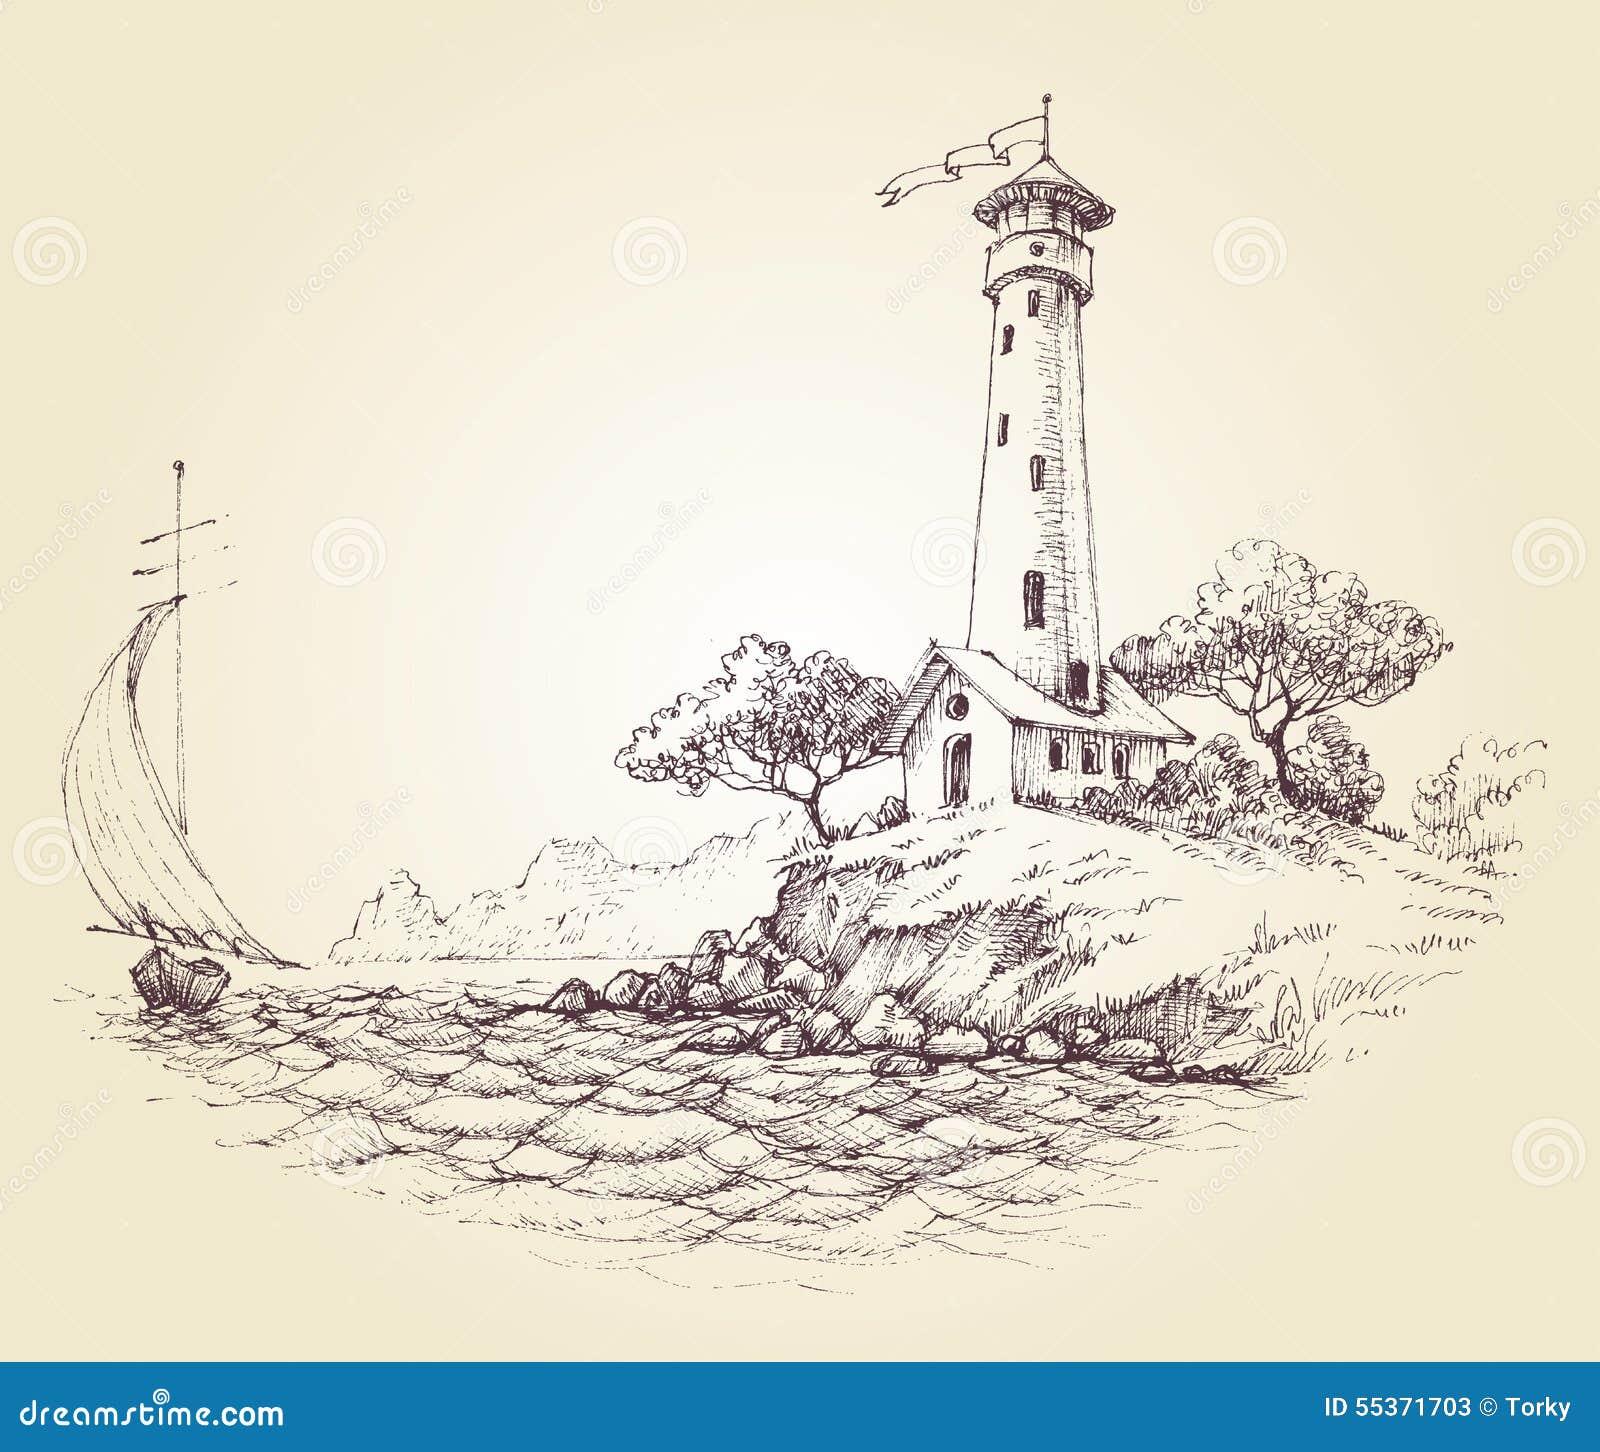 Dessin de phare illustration de vecteur illustration du - Dessin de phare ...